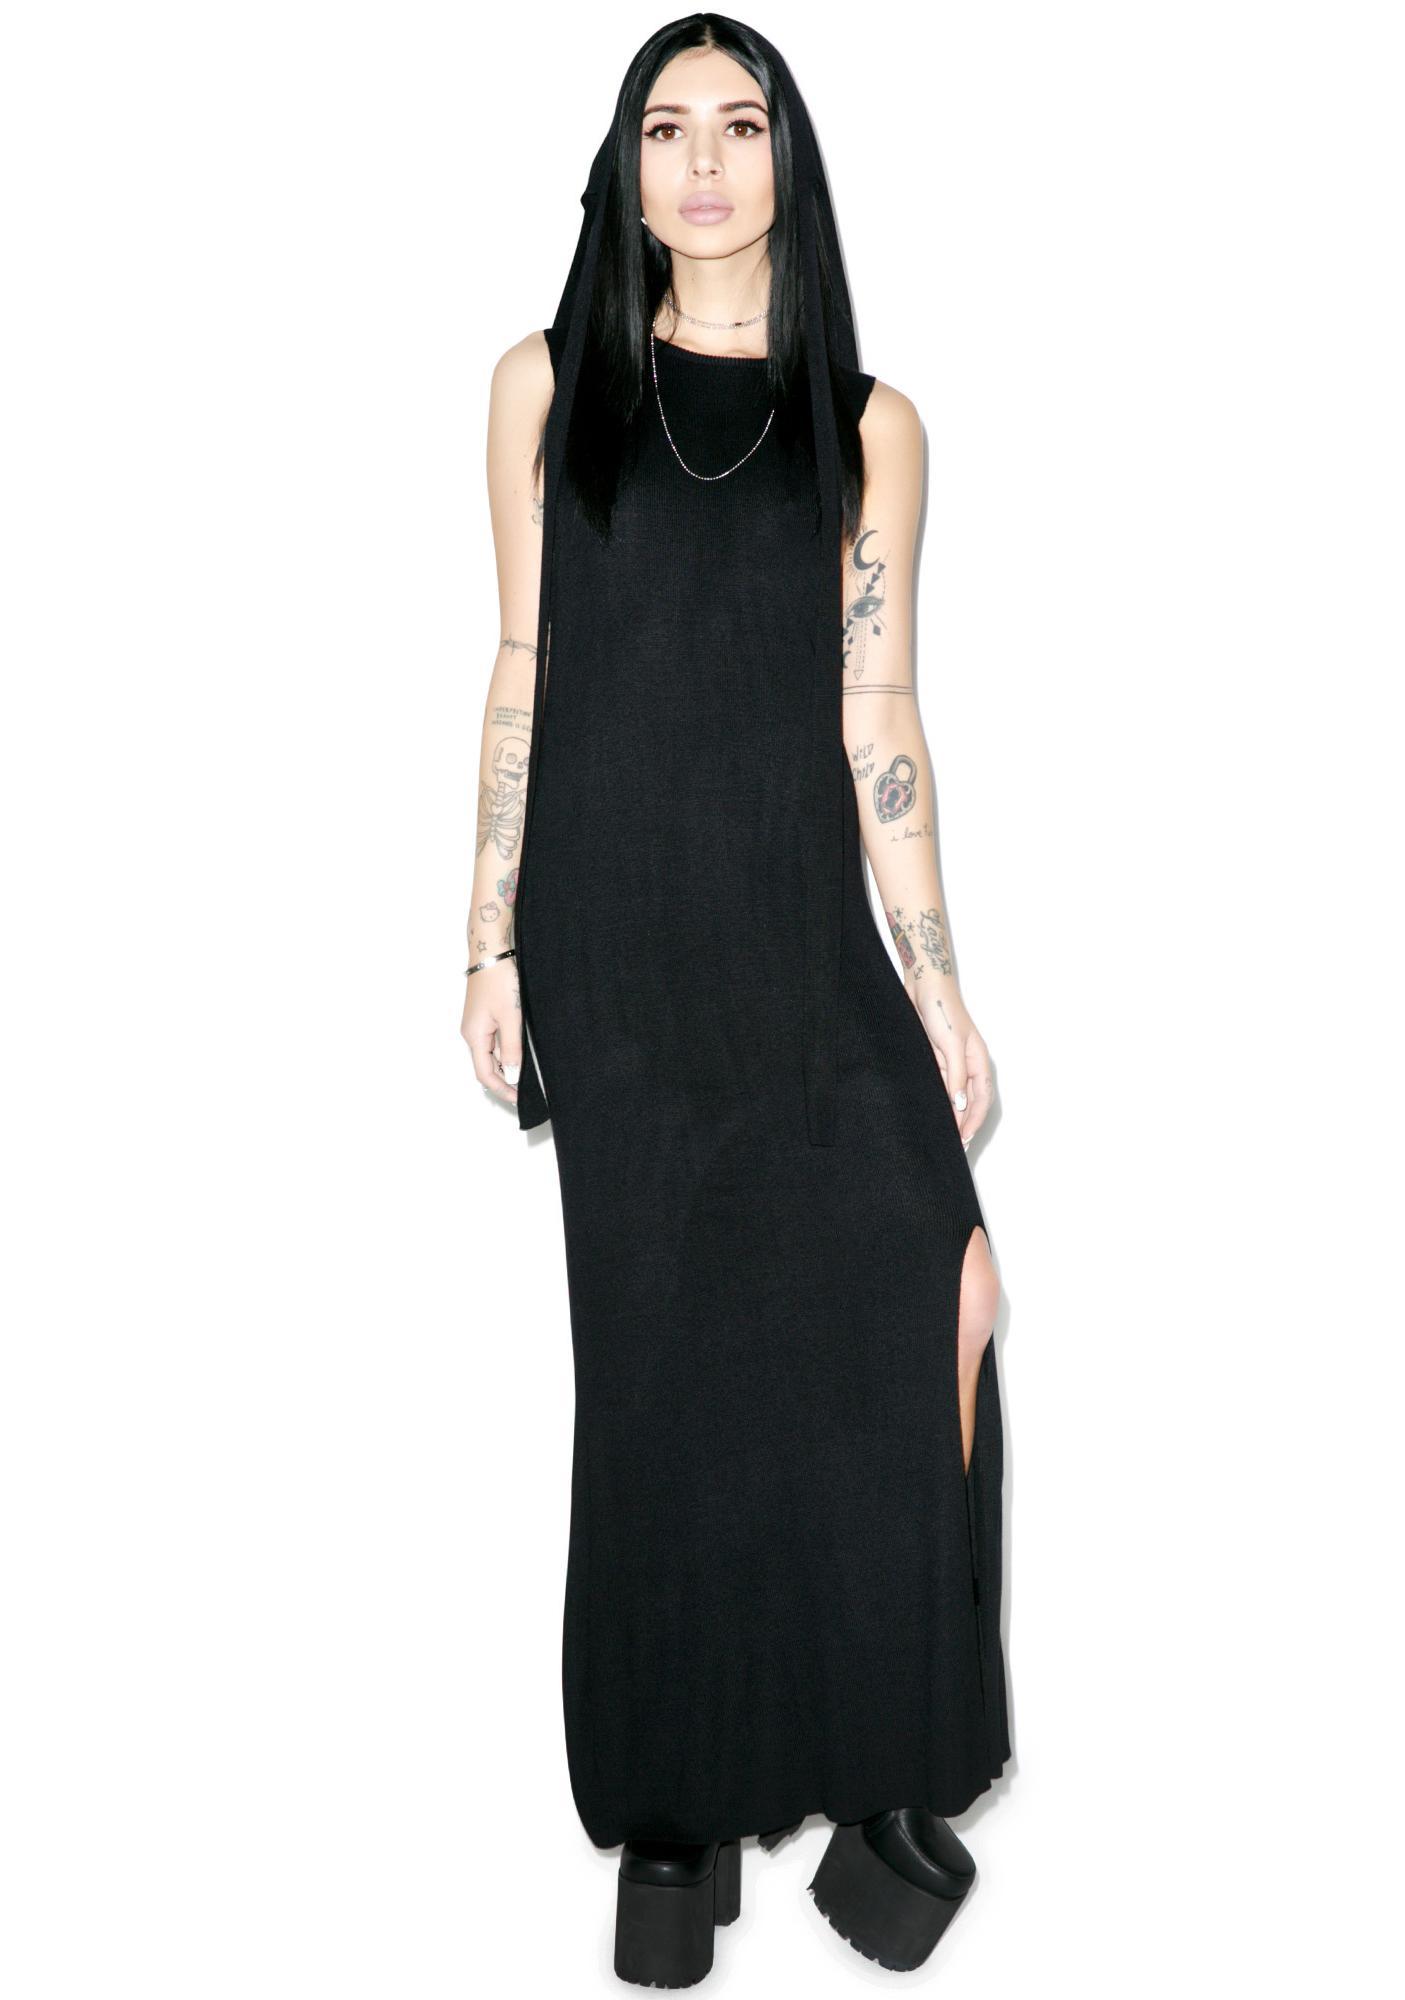 Black Scale Maiden Dress